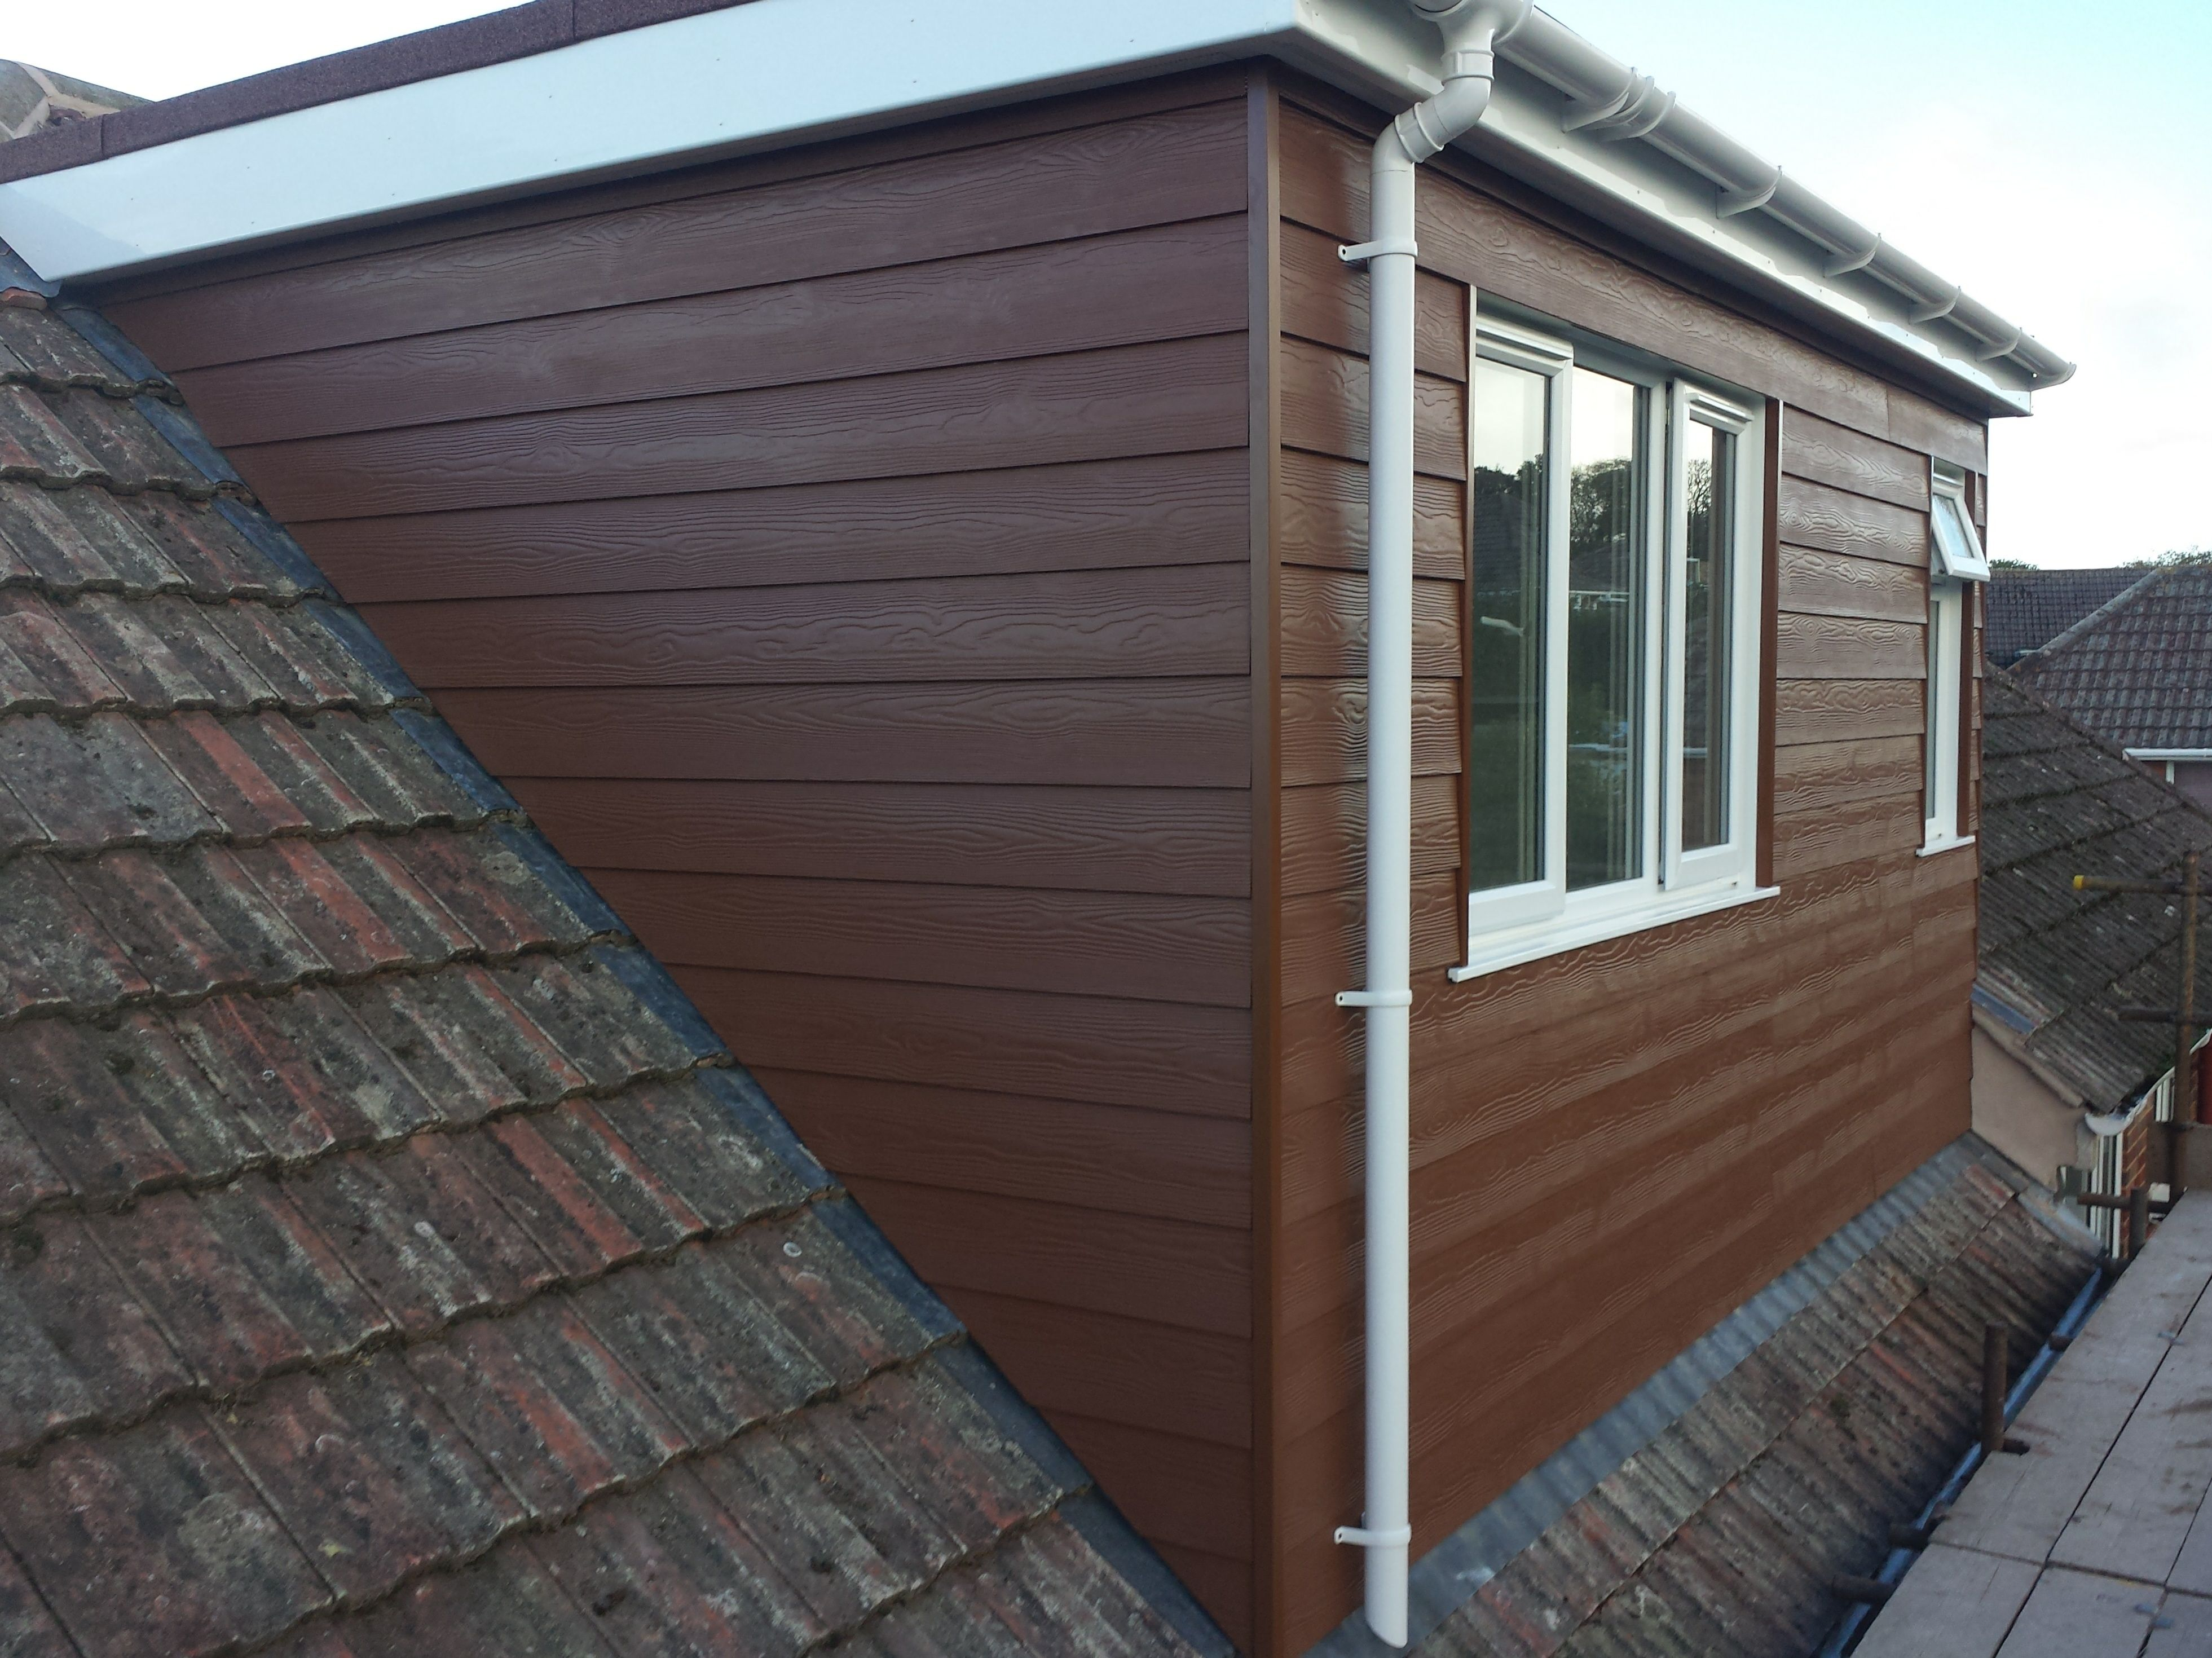 attic dormer design ideas - Flat Roof Dormers Dormers Attic Designs